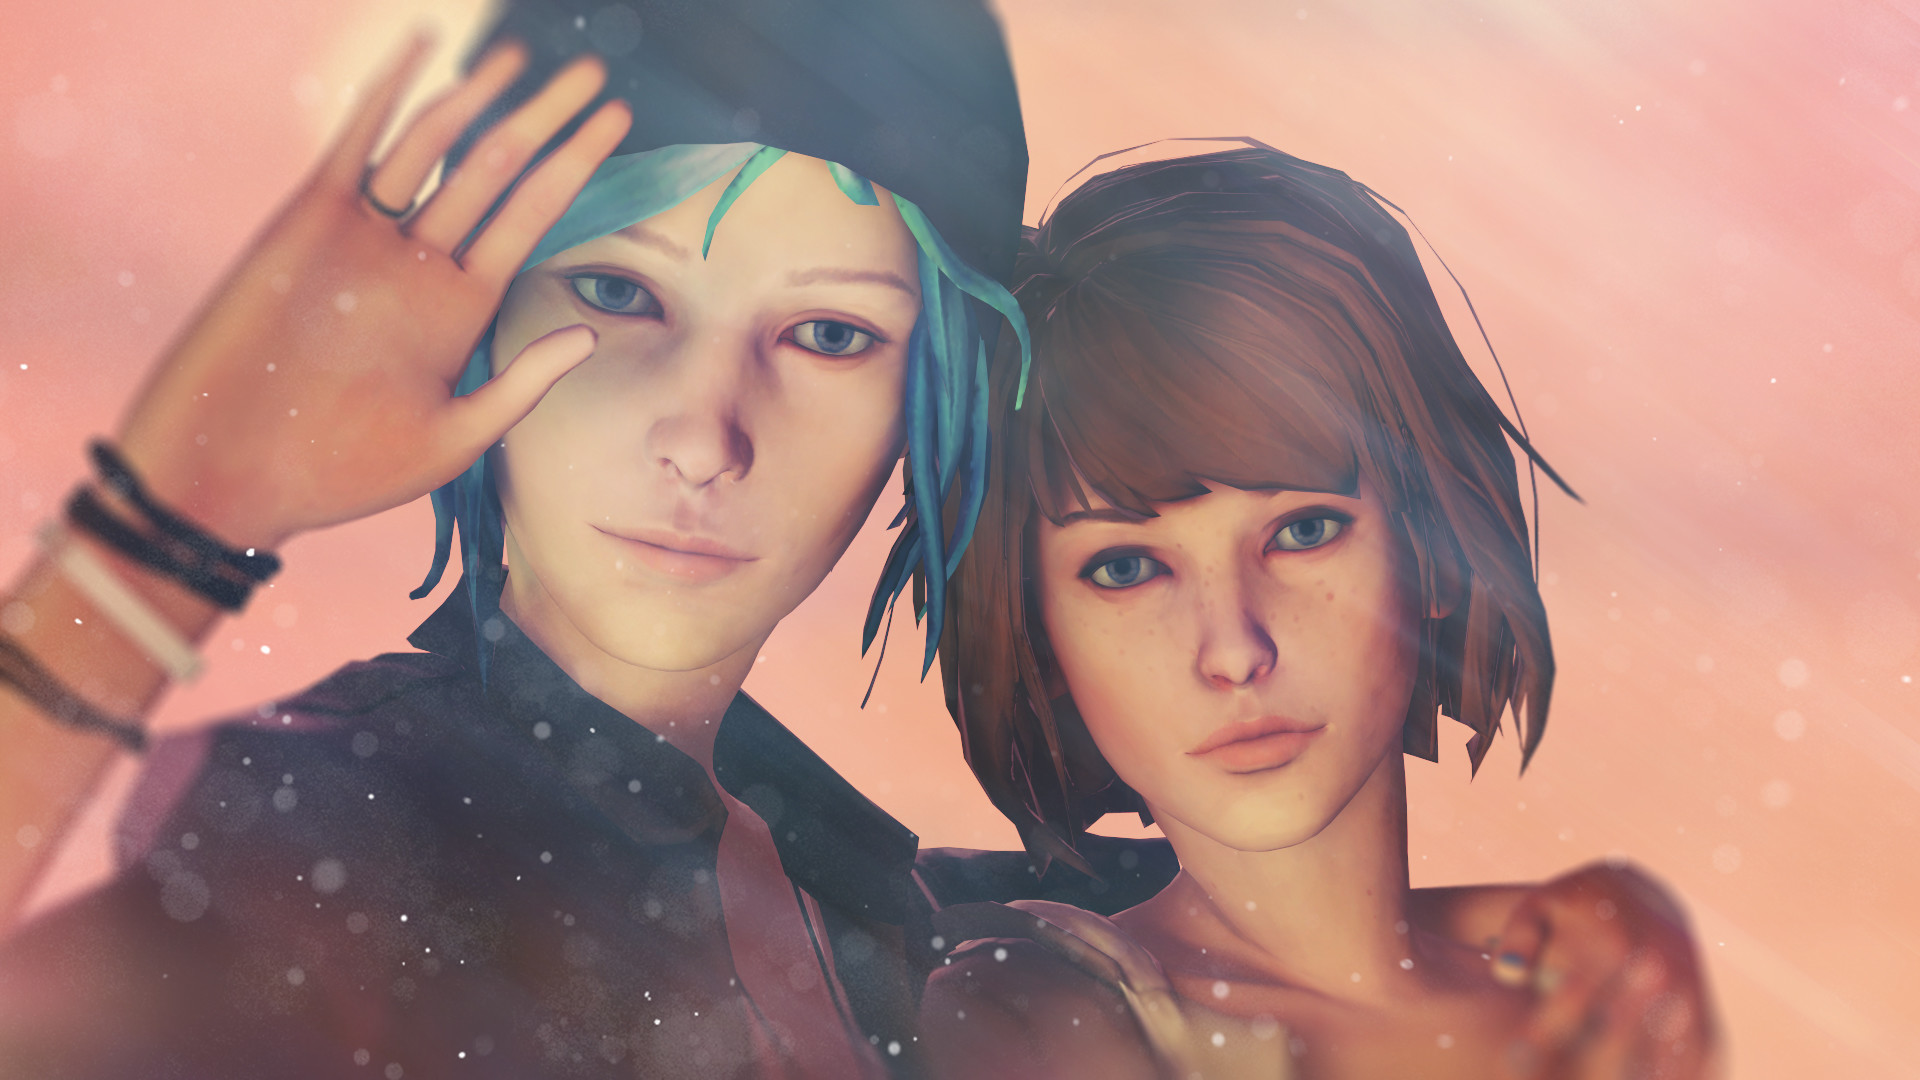 Life is strange – Max and Chloe [SFM] by Mrjimjamjamie on DeviantArt